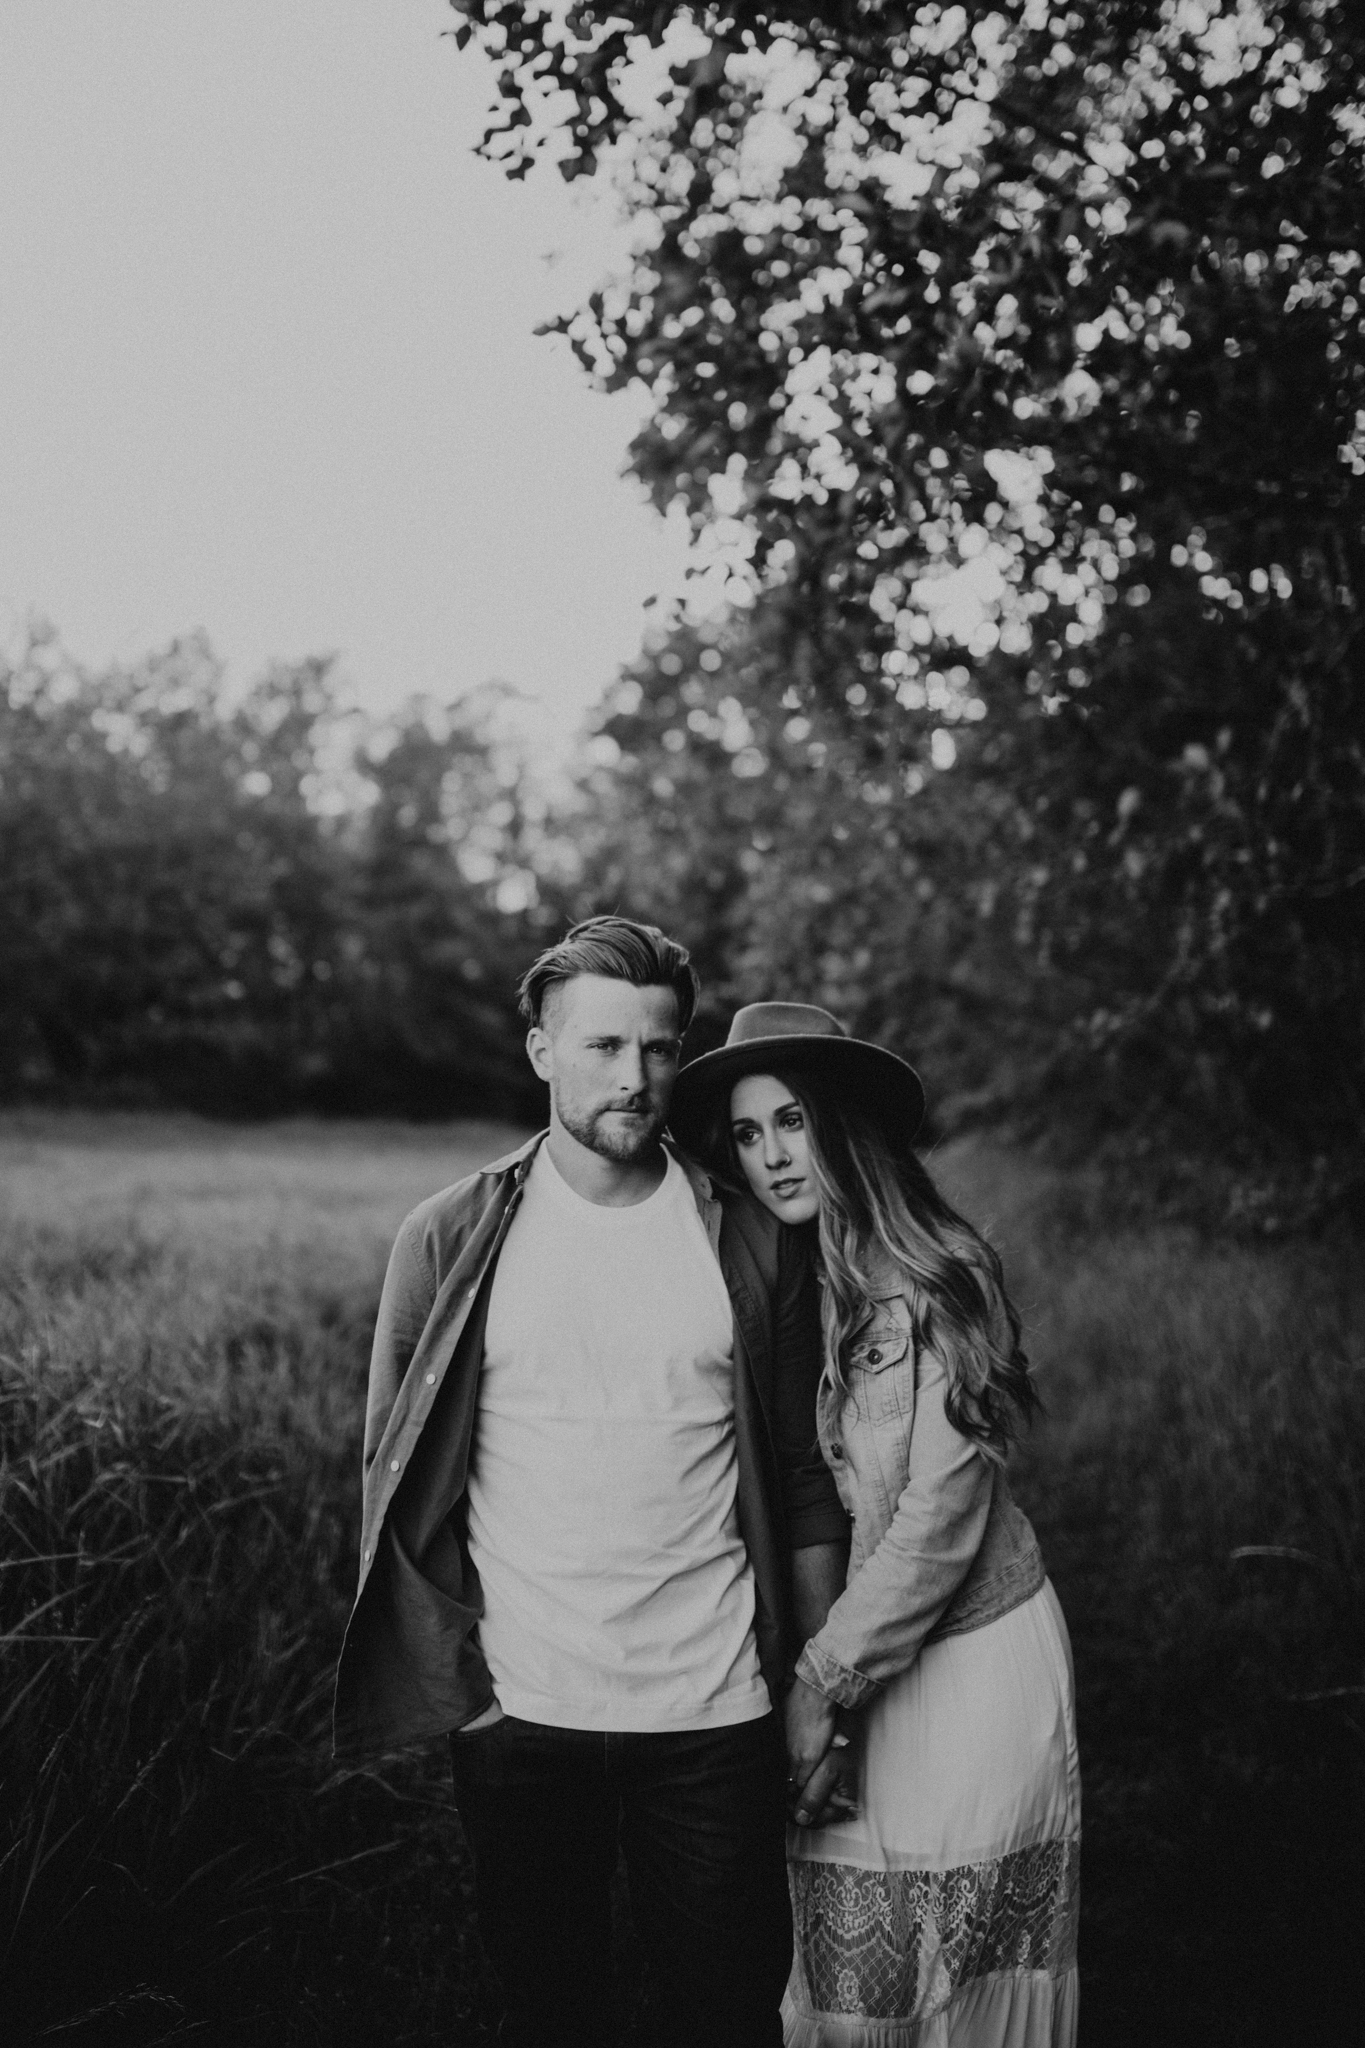 vancouver_wedding_engagement_photographer_005.JPG